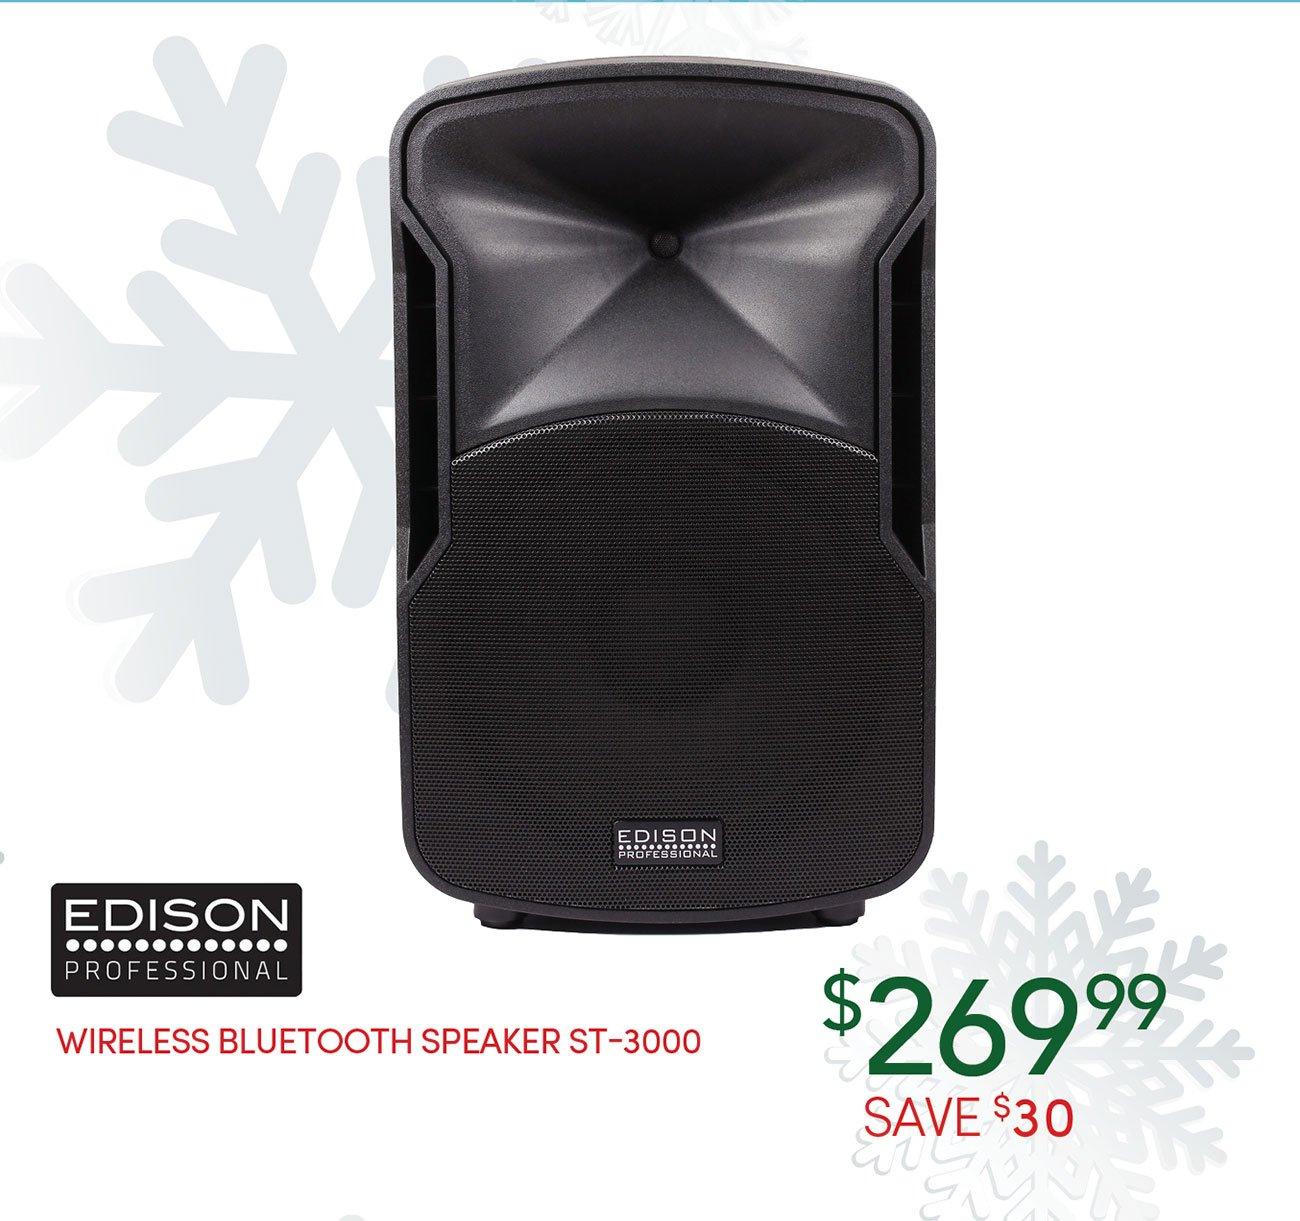 Wireless-bluetooth-speaker